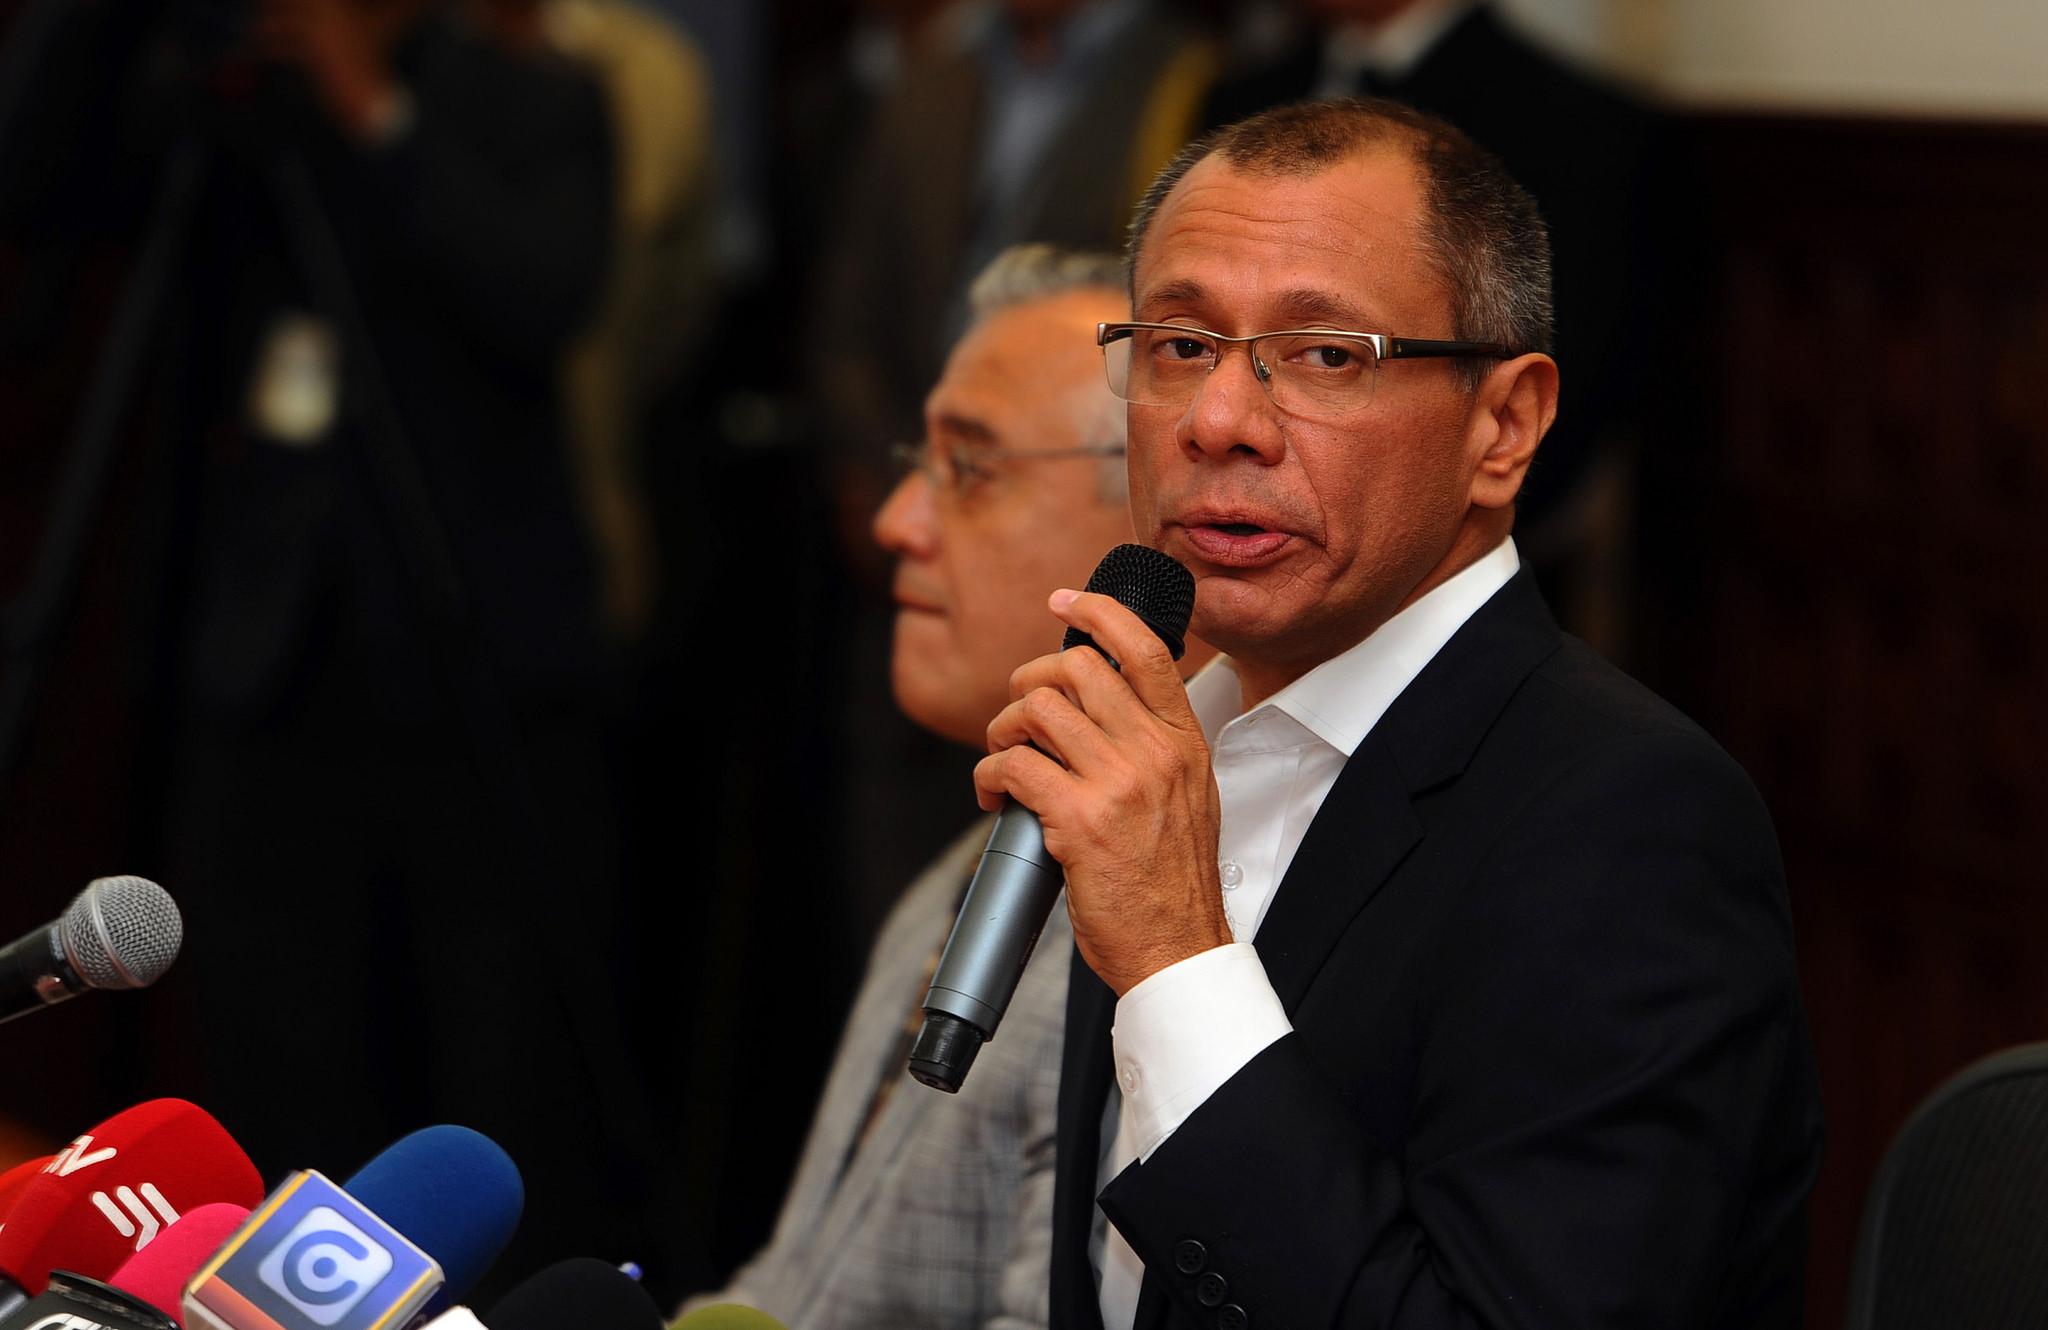 Fiscalía solicitará reparación integral en caso Odebrecht, aclara Baca